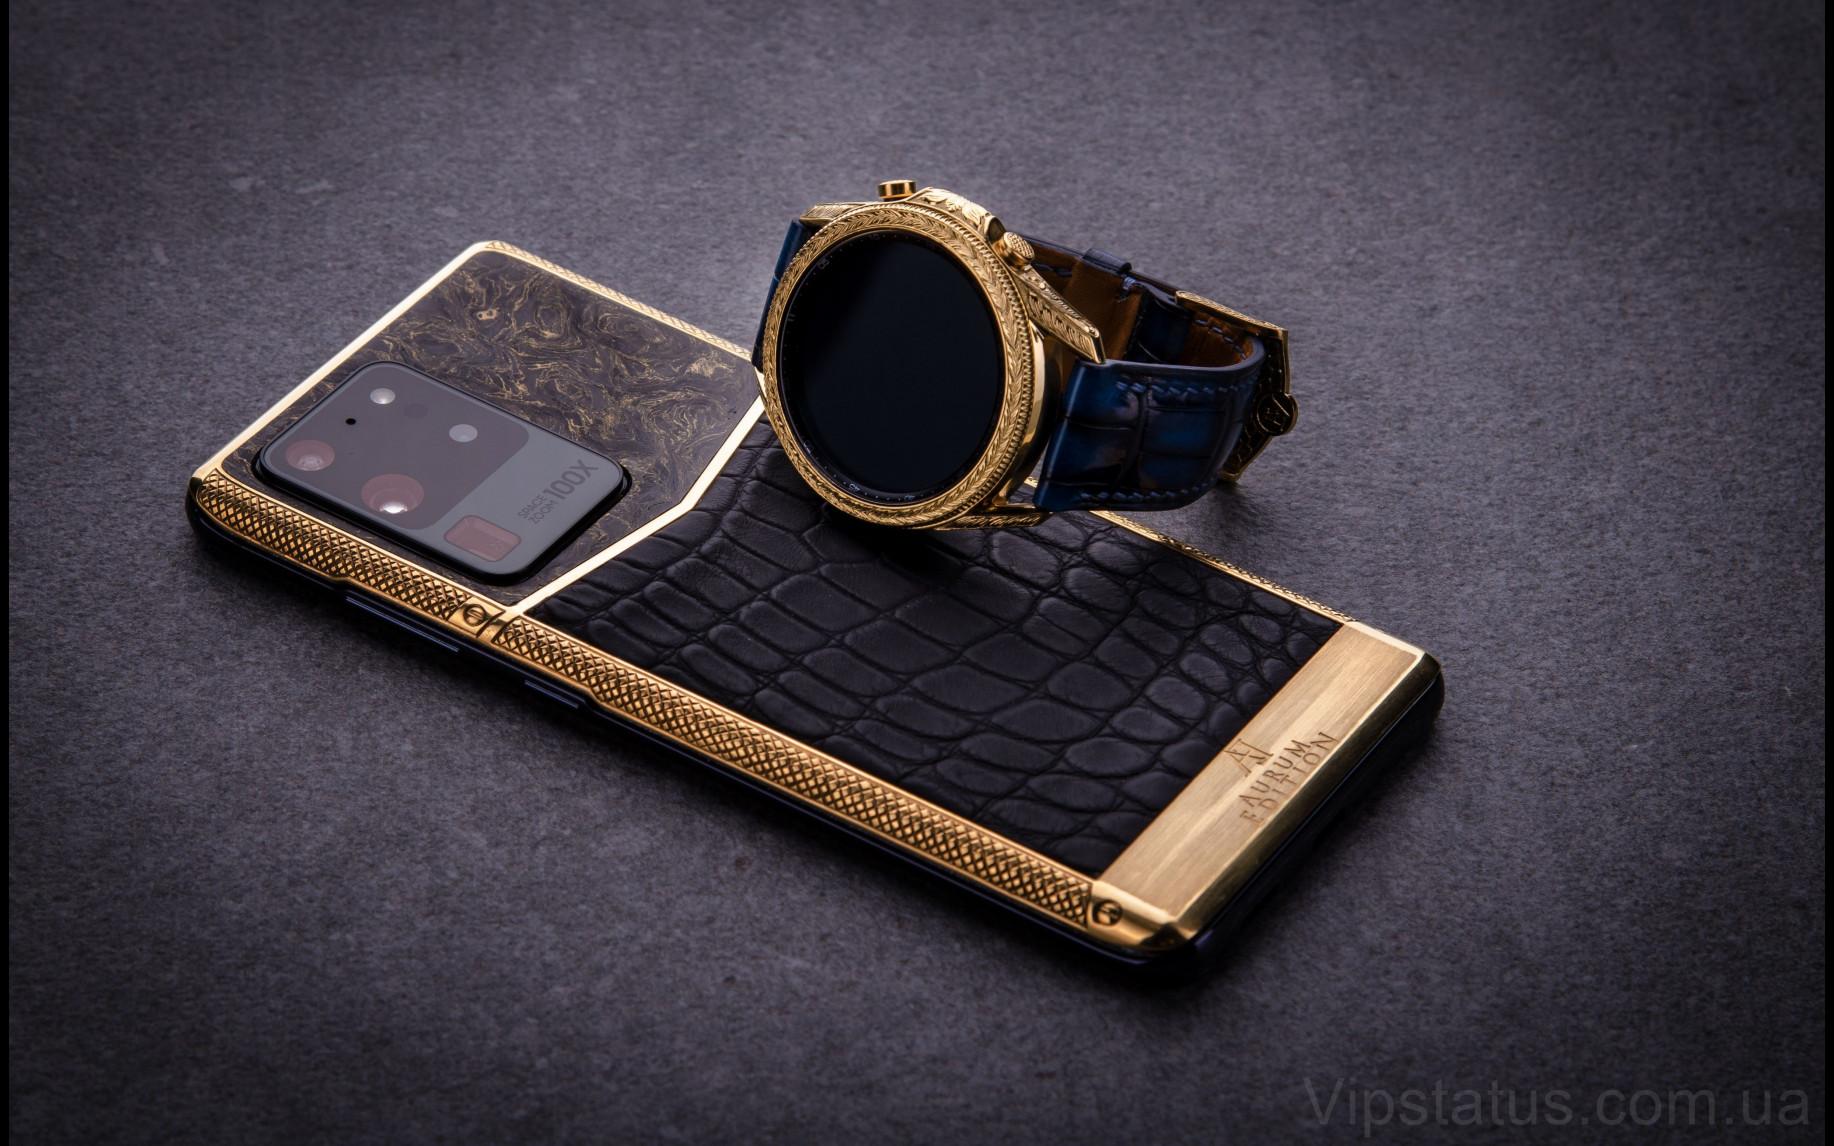 Elite Samsung S20 Gold Star Samsung S20 Gold Star image 12